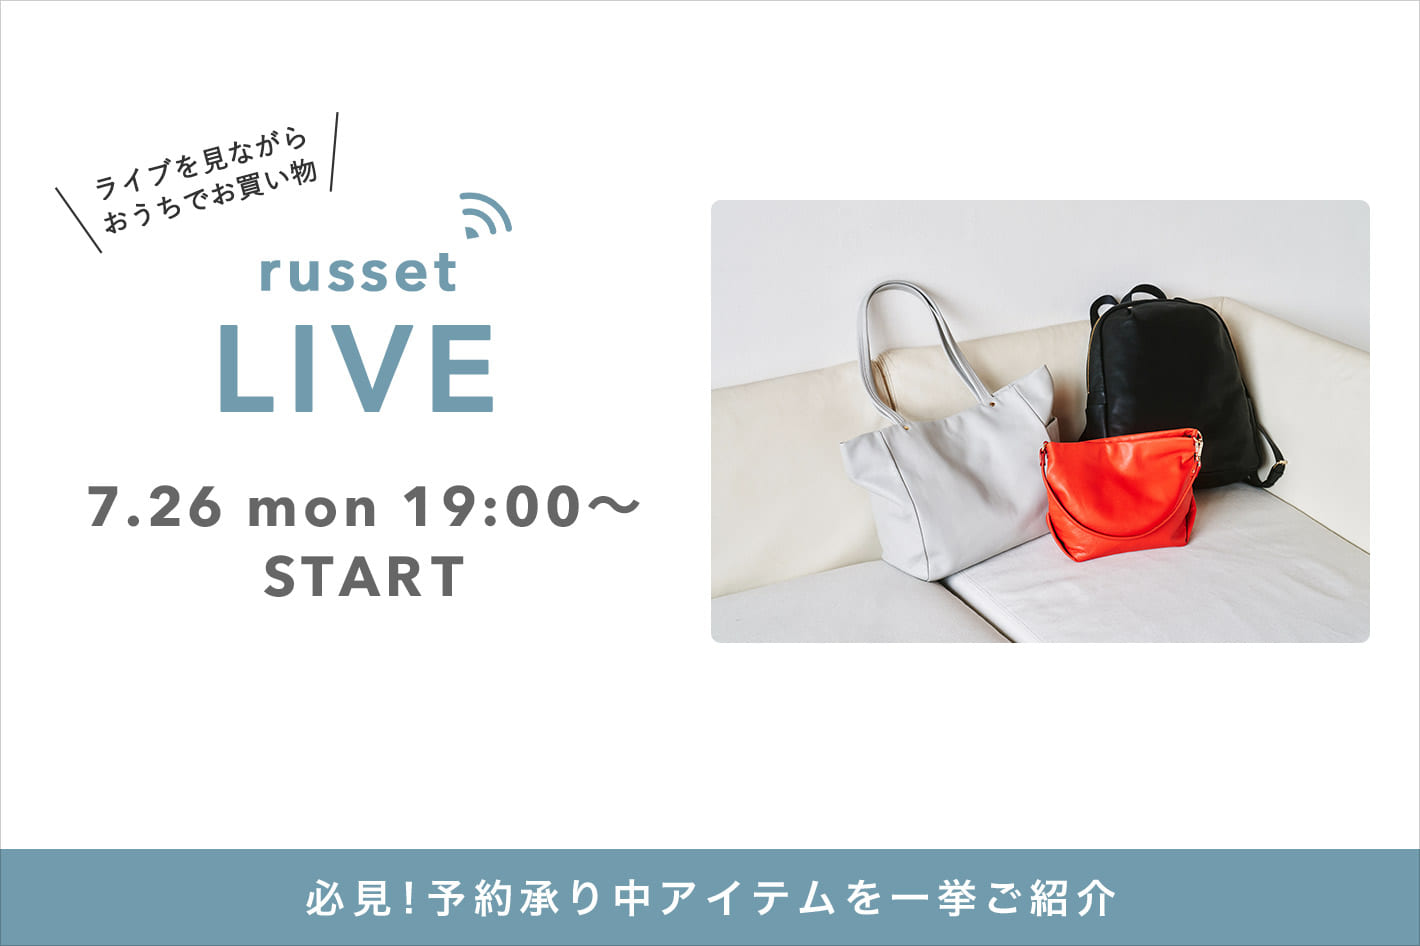 russet ≪russet LIVE≫7/26 19:00~生配信スタート!